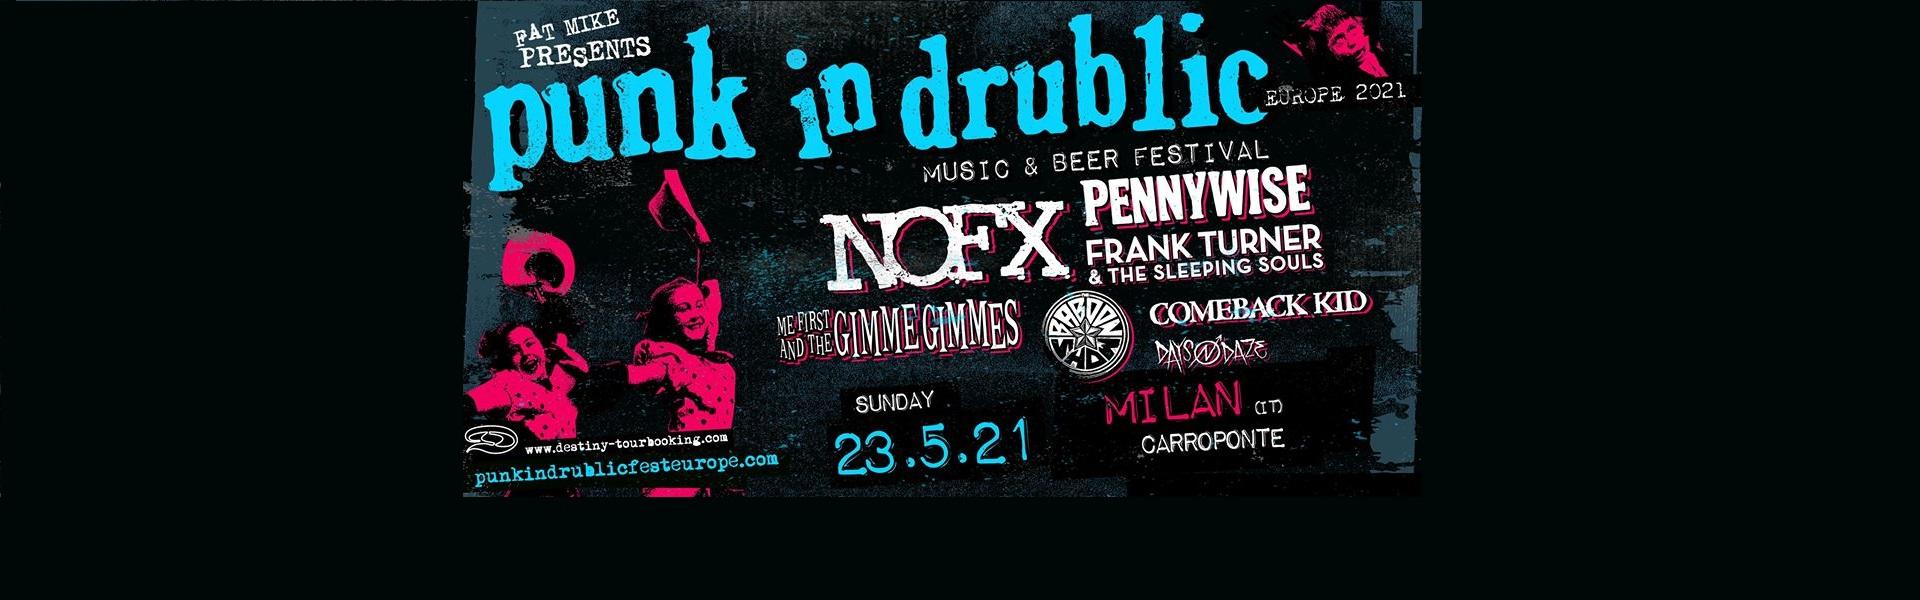 Punk in Drublic 23/05/2021 Carroponte Milano biglietti tickets nofx mailtickets | notizie